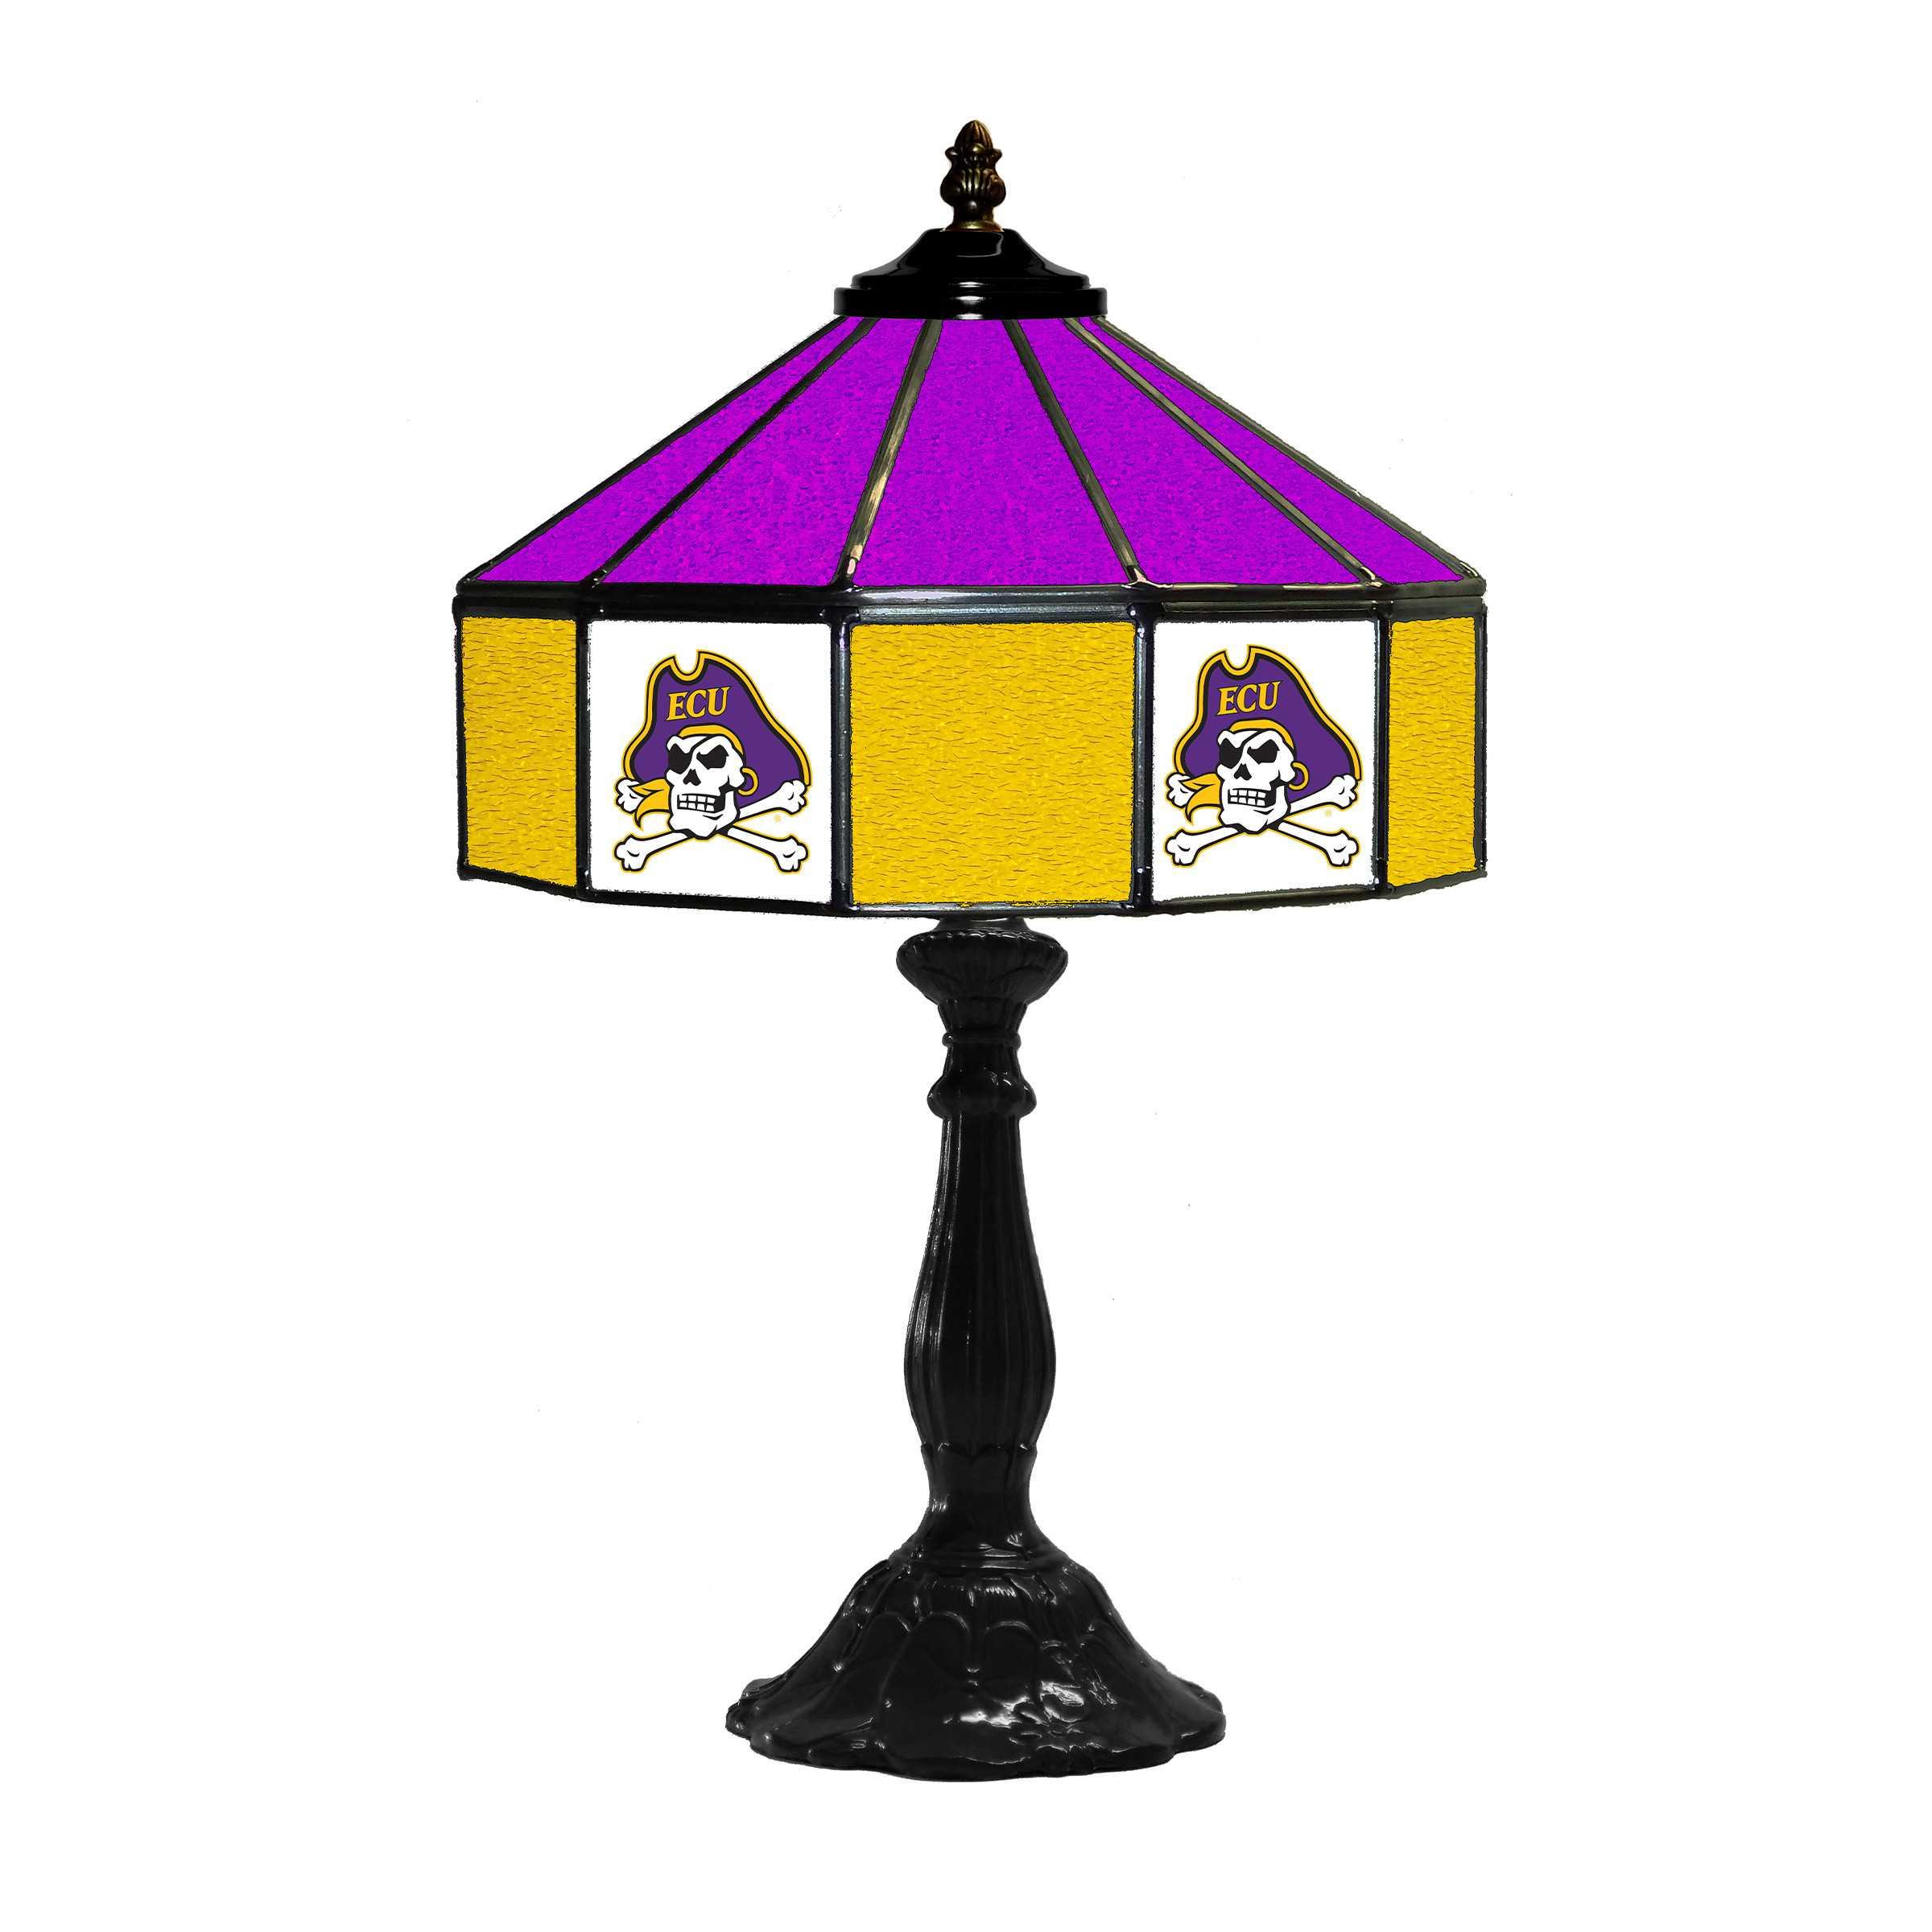 "EASTERN CAROLINA UNIVERSITY 21"" GLASS TABLE LAMP"